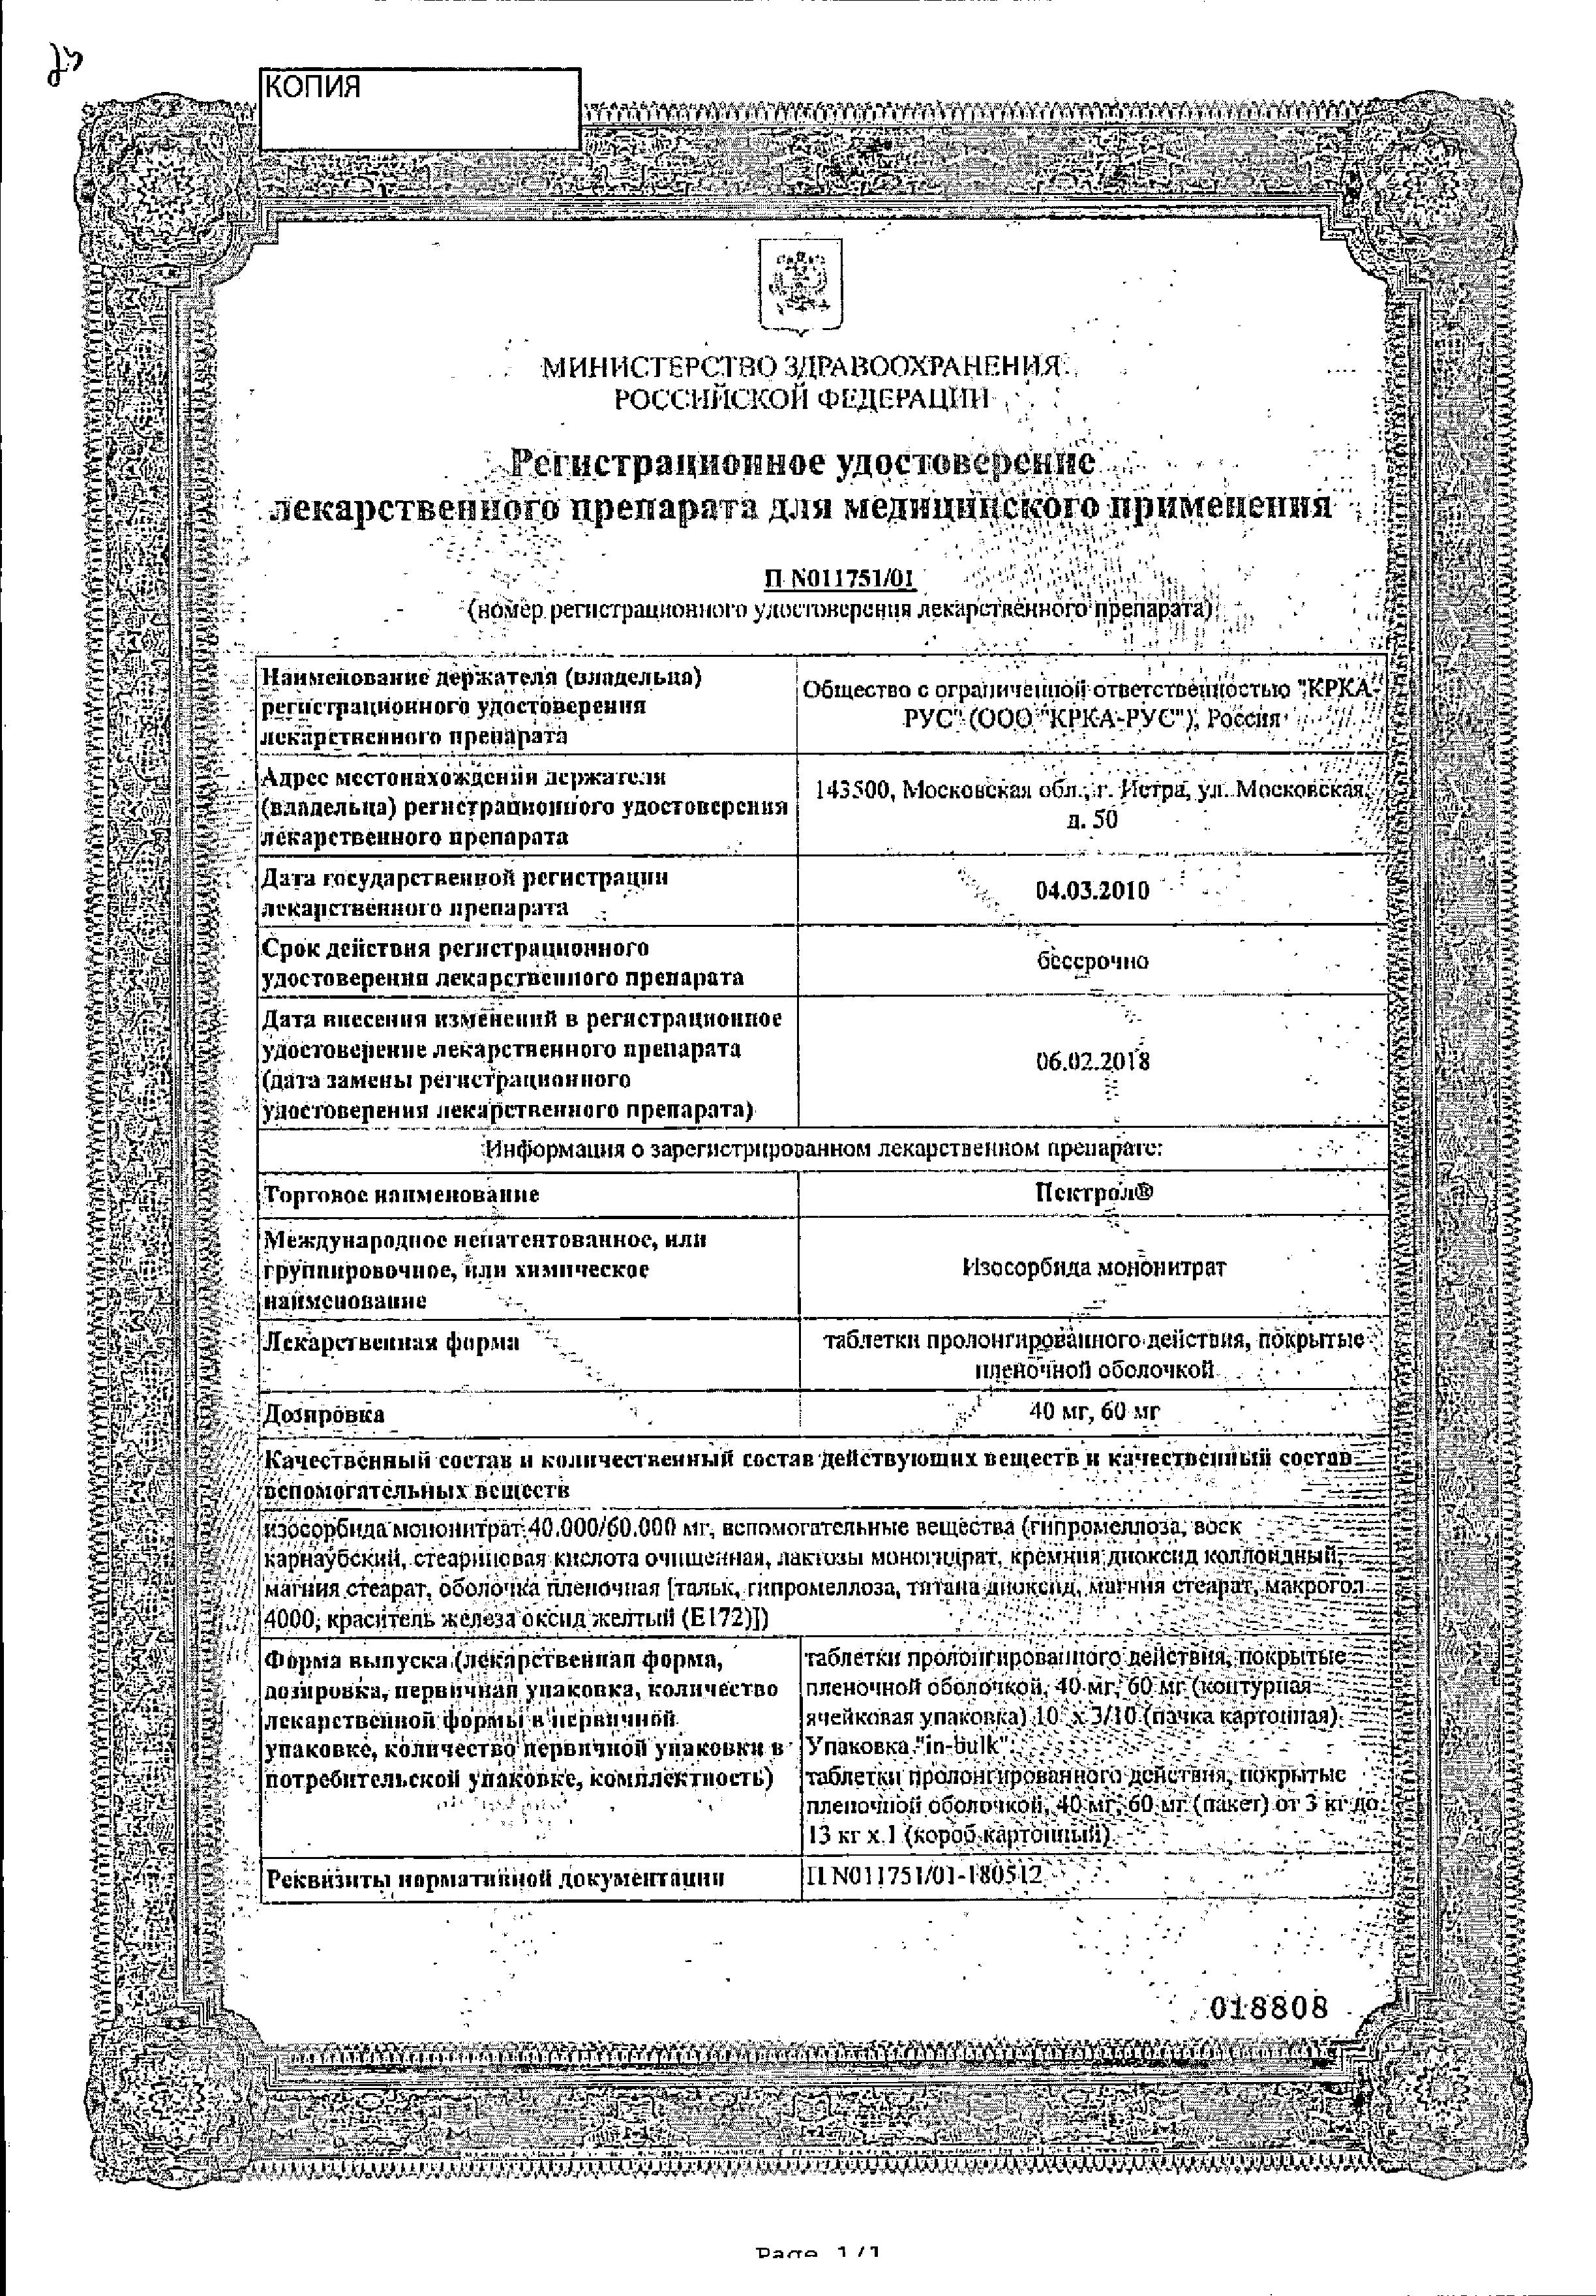 Пектрол сертификат